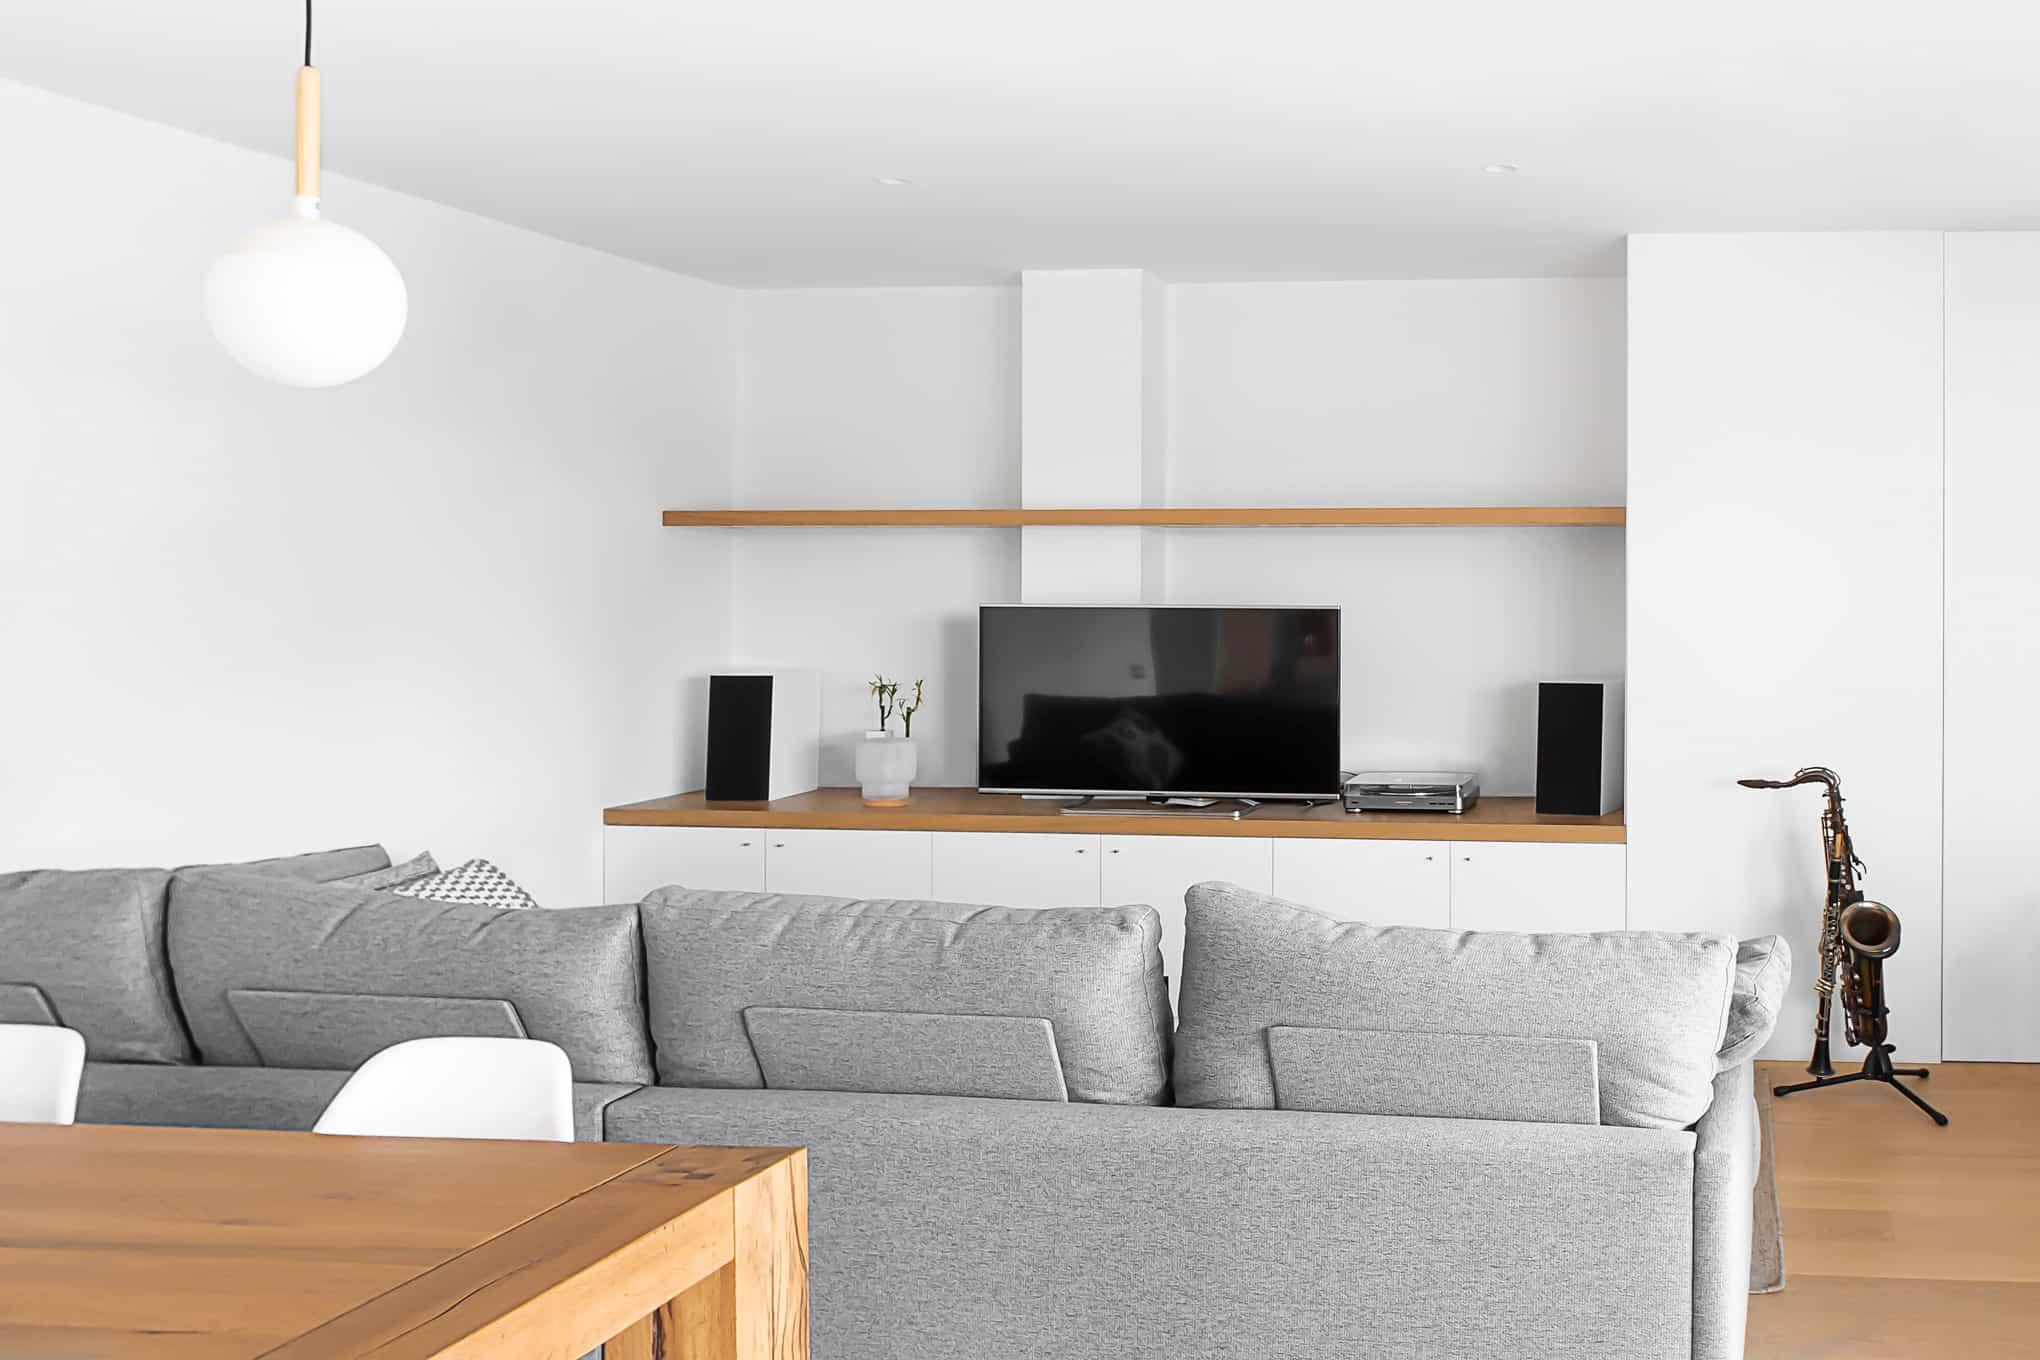 Valencia-bop-Barcelona-arquitectura-interiorismo-construccion-8